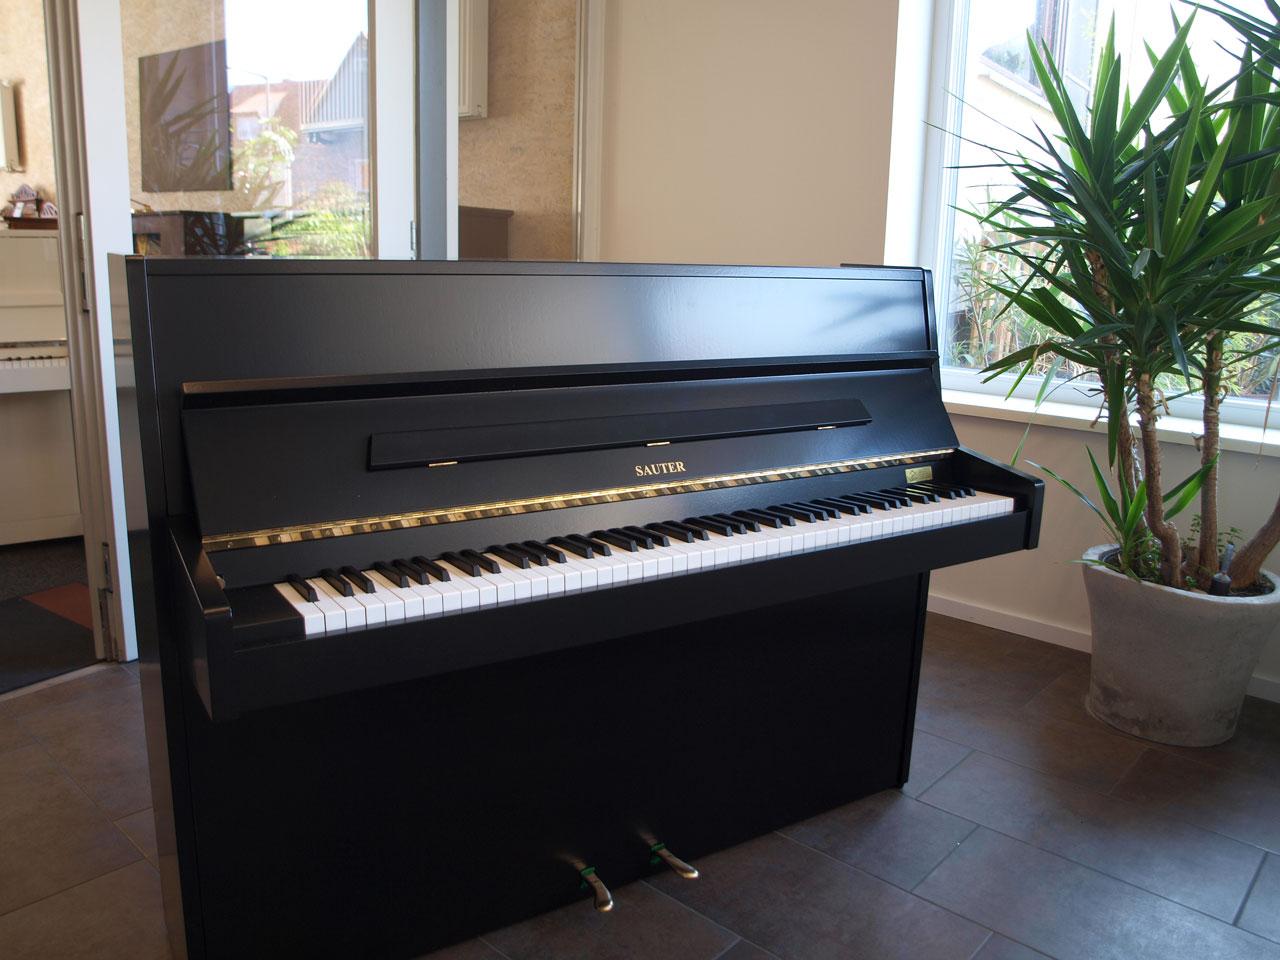 Sauter Klavier, Mod. 109